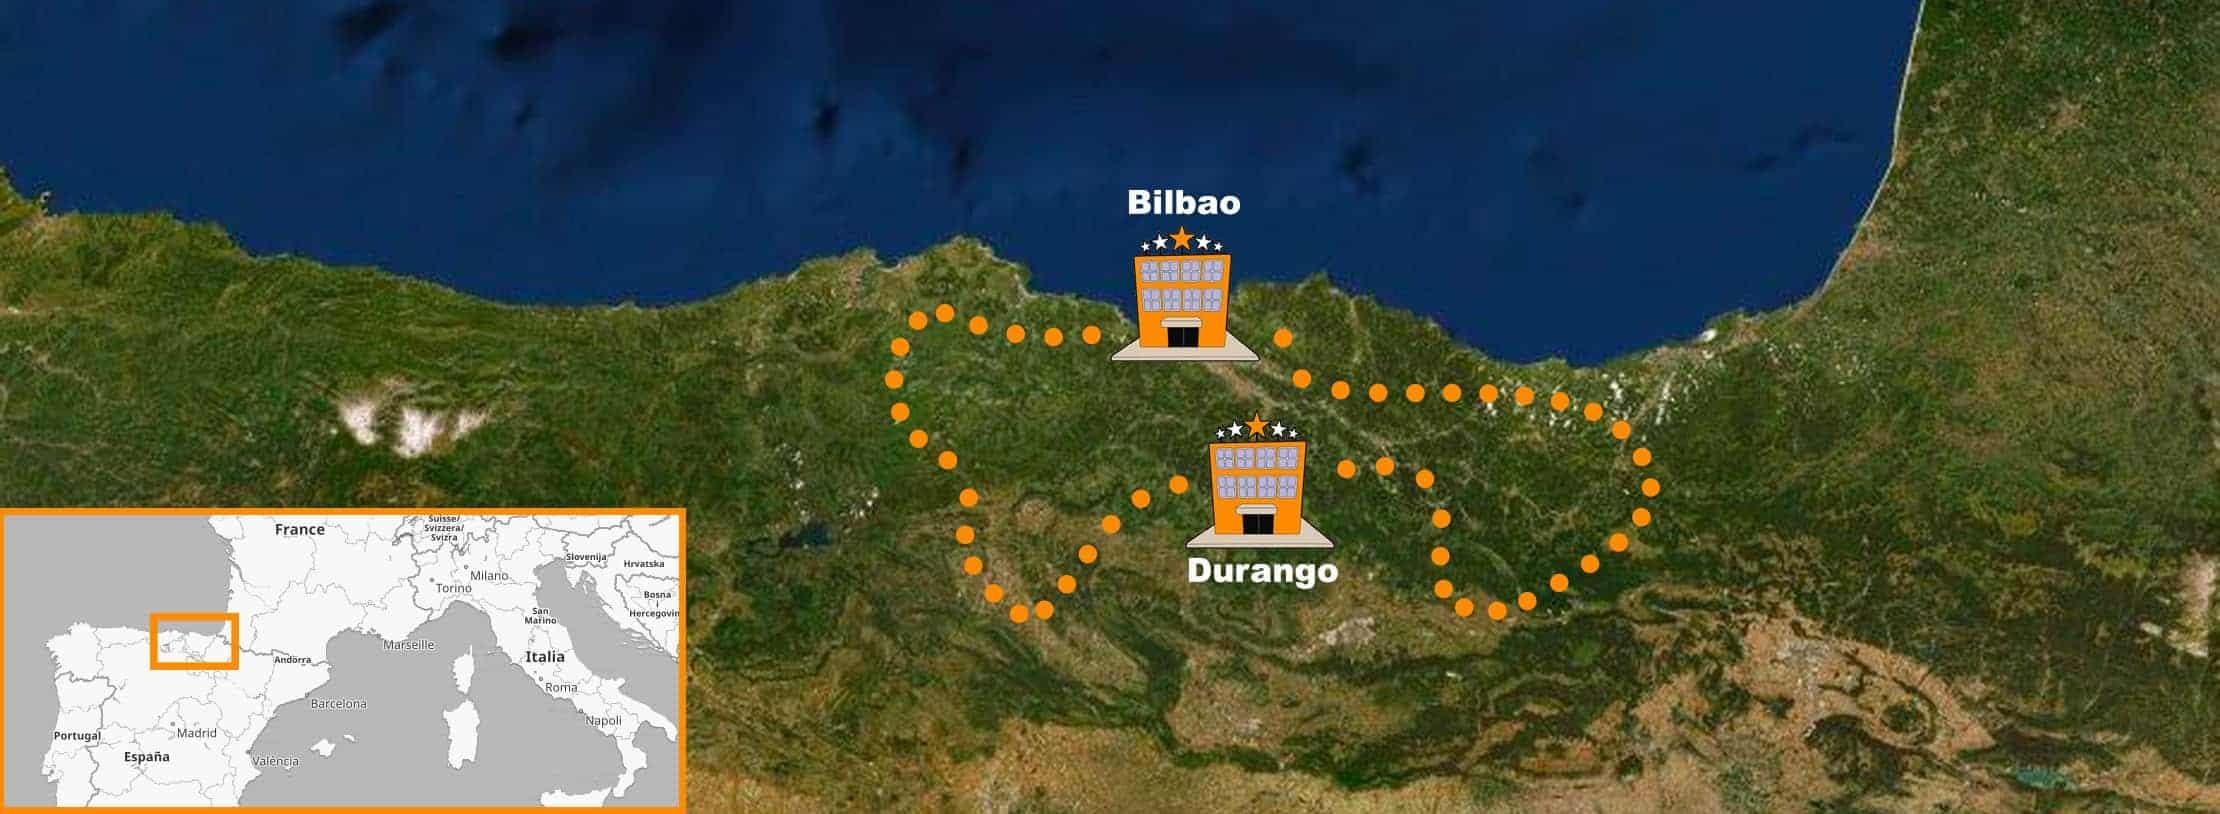 itinerario Viaje Organizado en moto Norte de España Bilbao